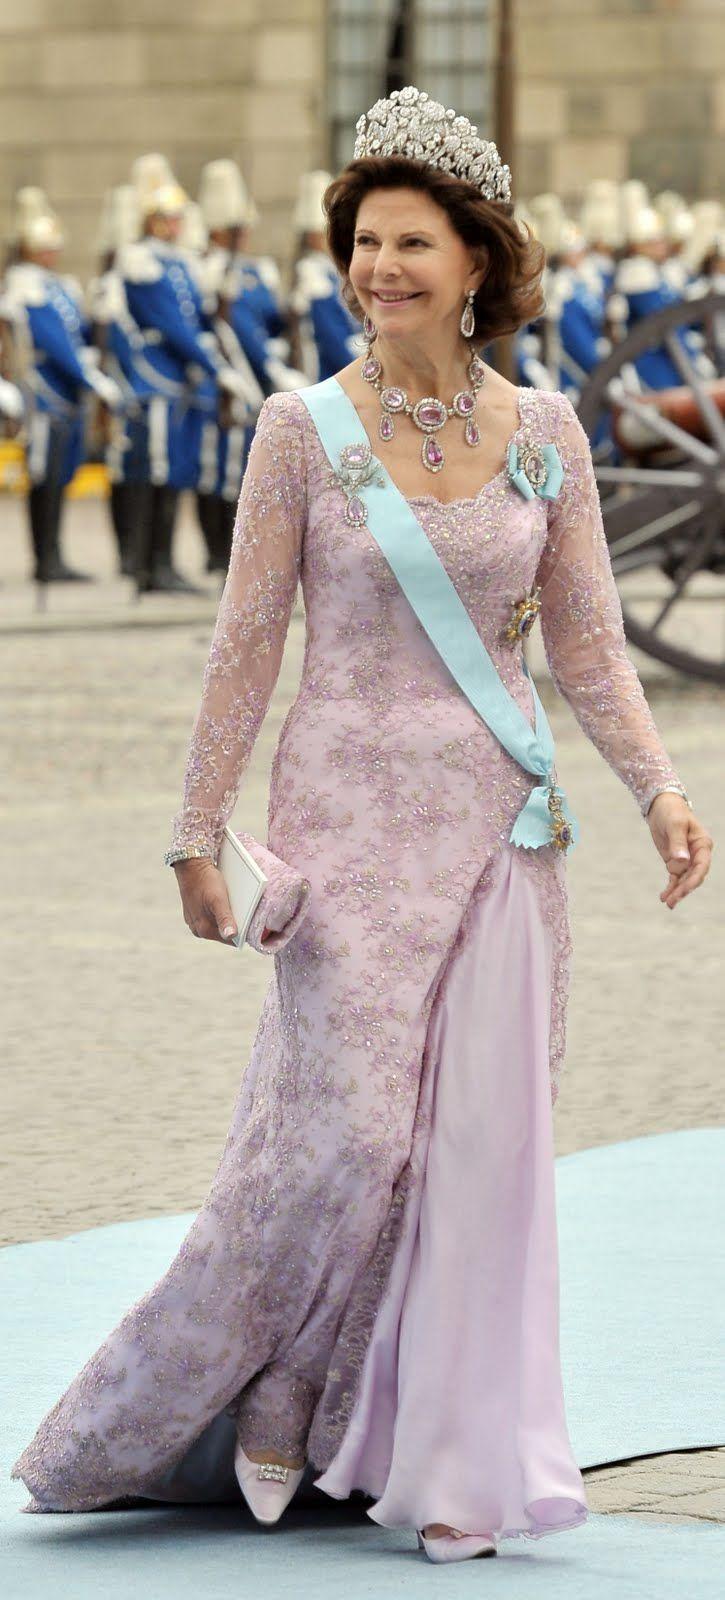 Crown Princess Victoria: Queen Silvia at Royal Wedding